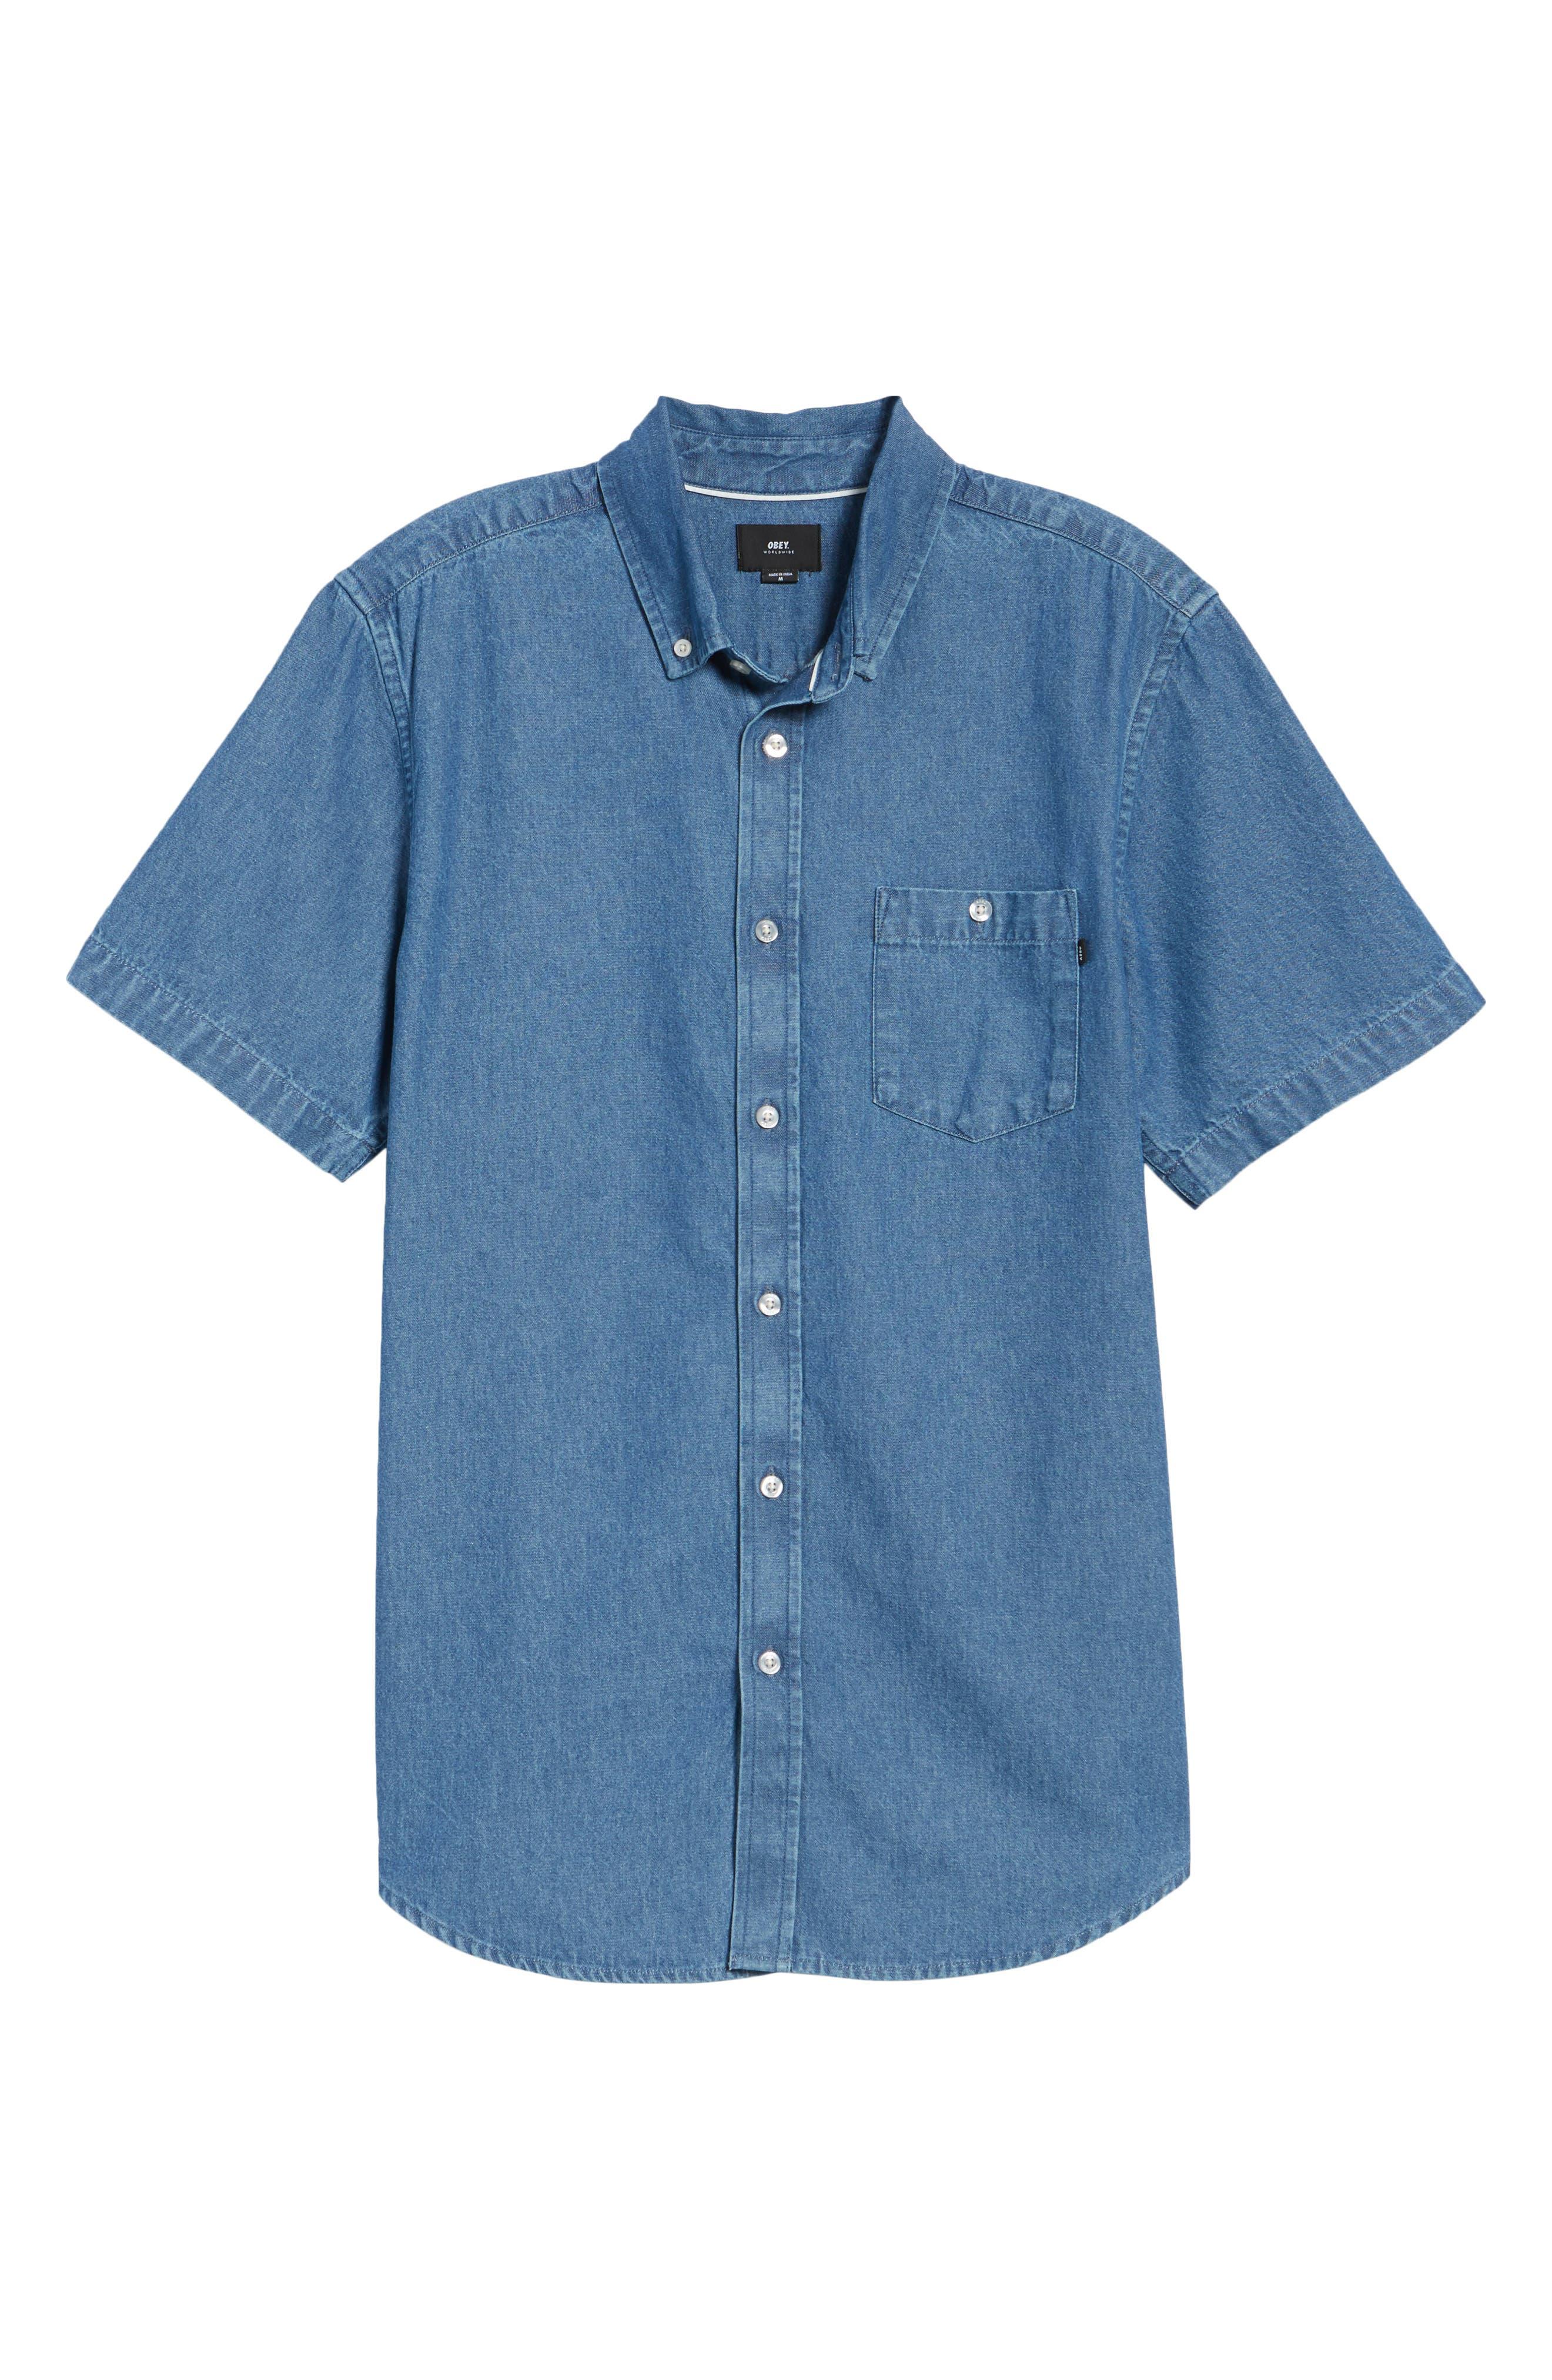 Kebble Denim Shirt,                             Alternate thumbnail 6, color,                             450